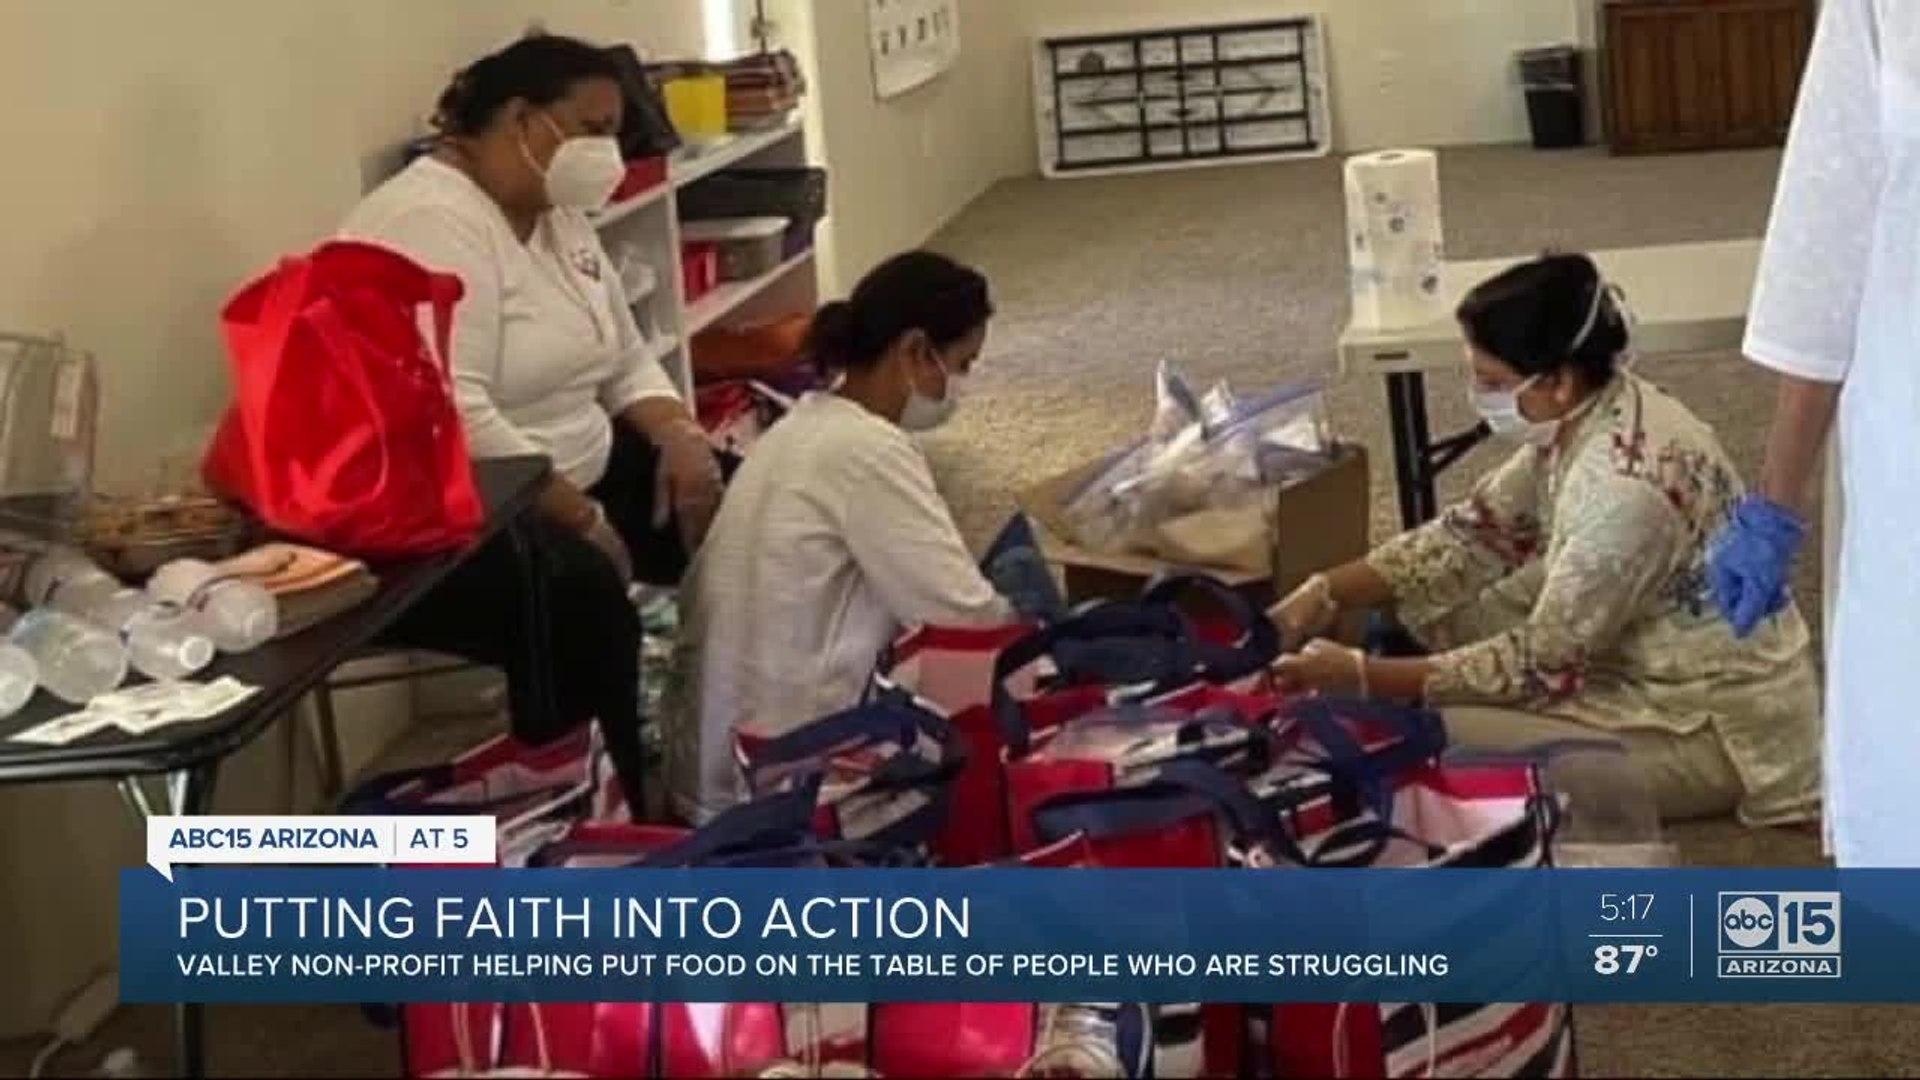 Valley non-profit puts faith into action